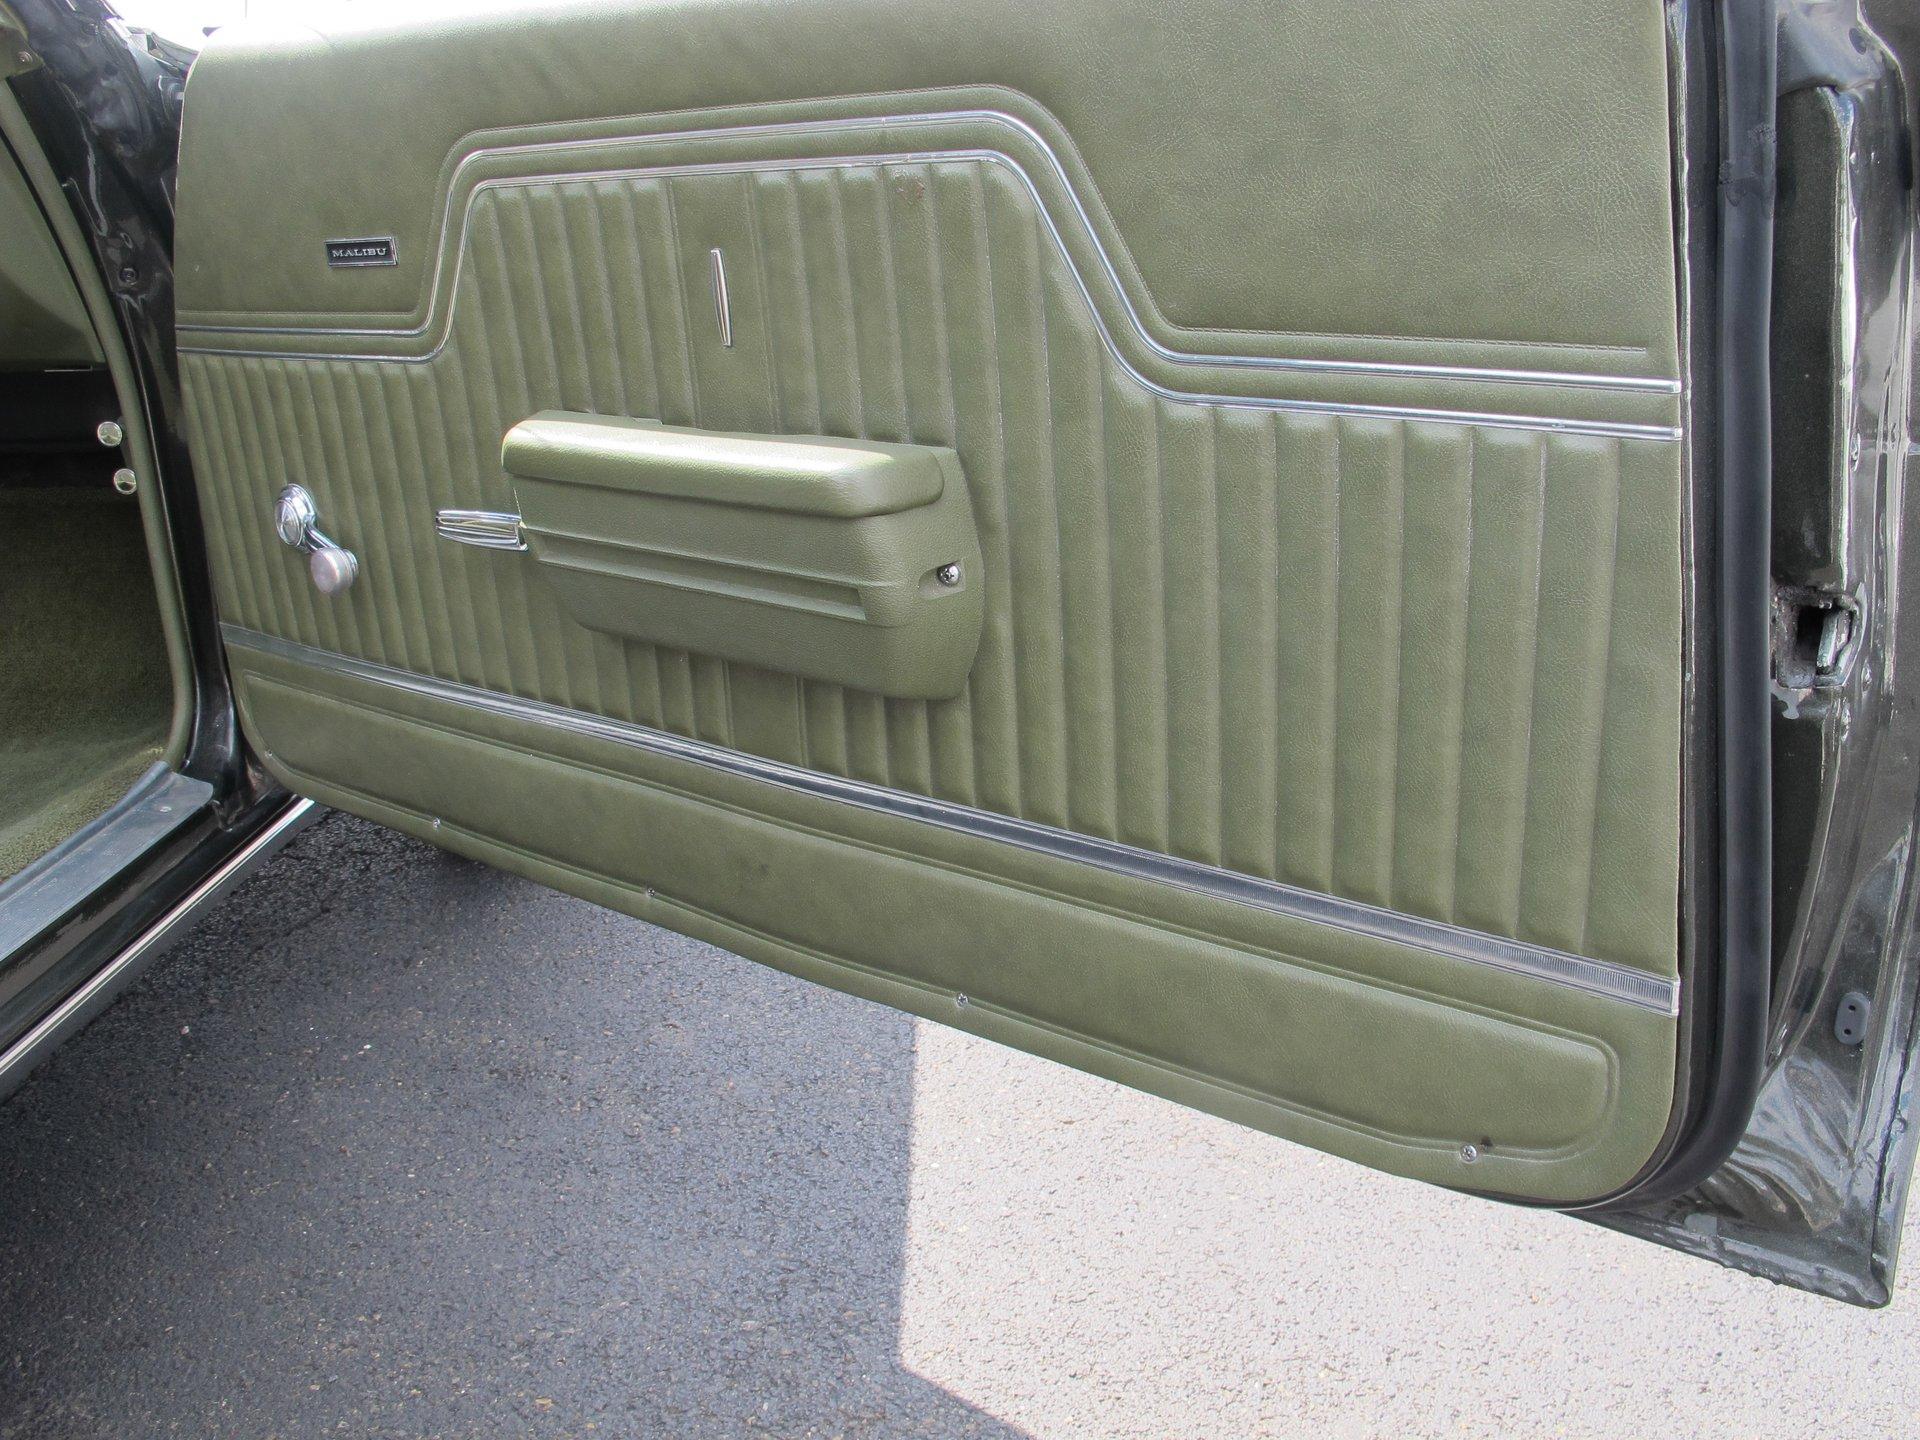 1971 Chevrolet Chevelle Malibu | OLD FORGE MOTORCARS INC